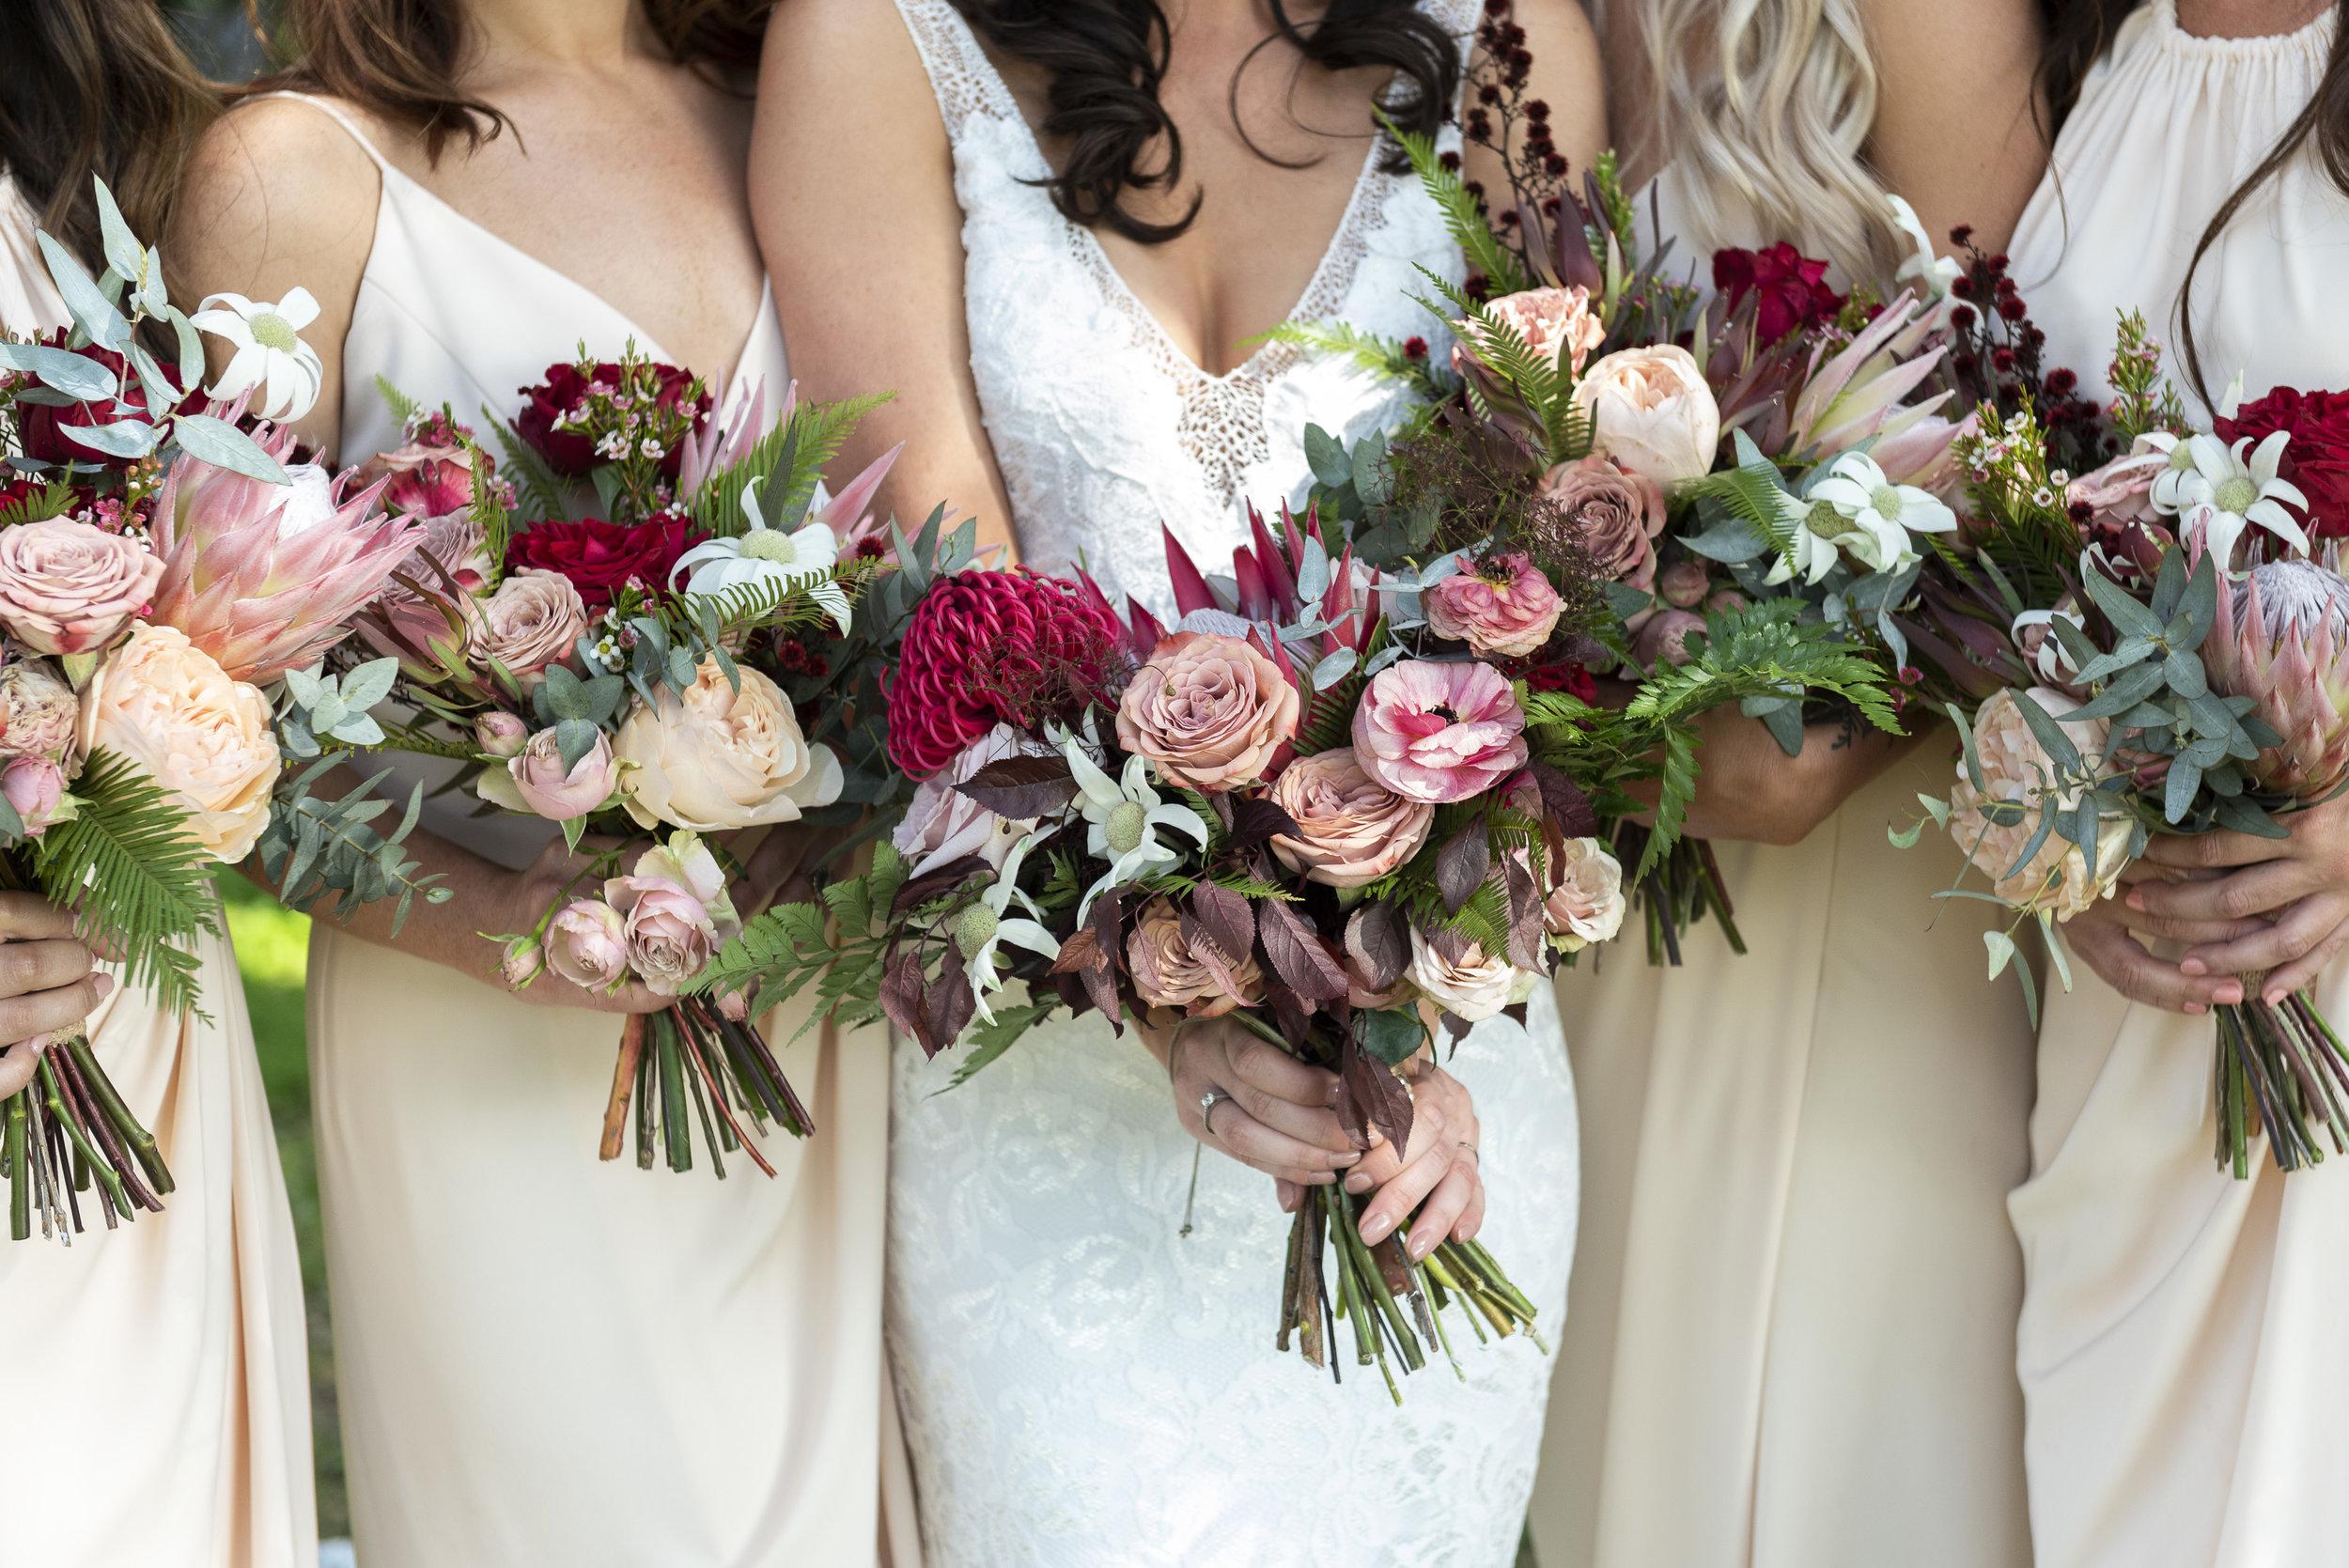 weddings by atelier photography-wedding-01-4.jpg